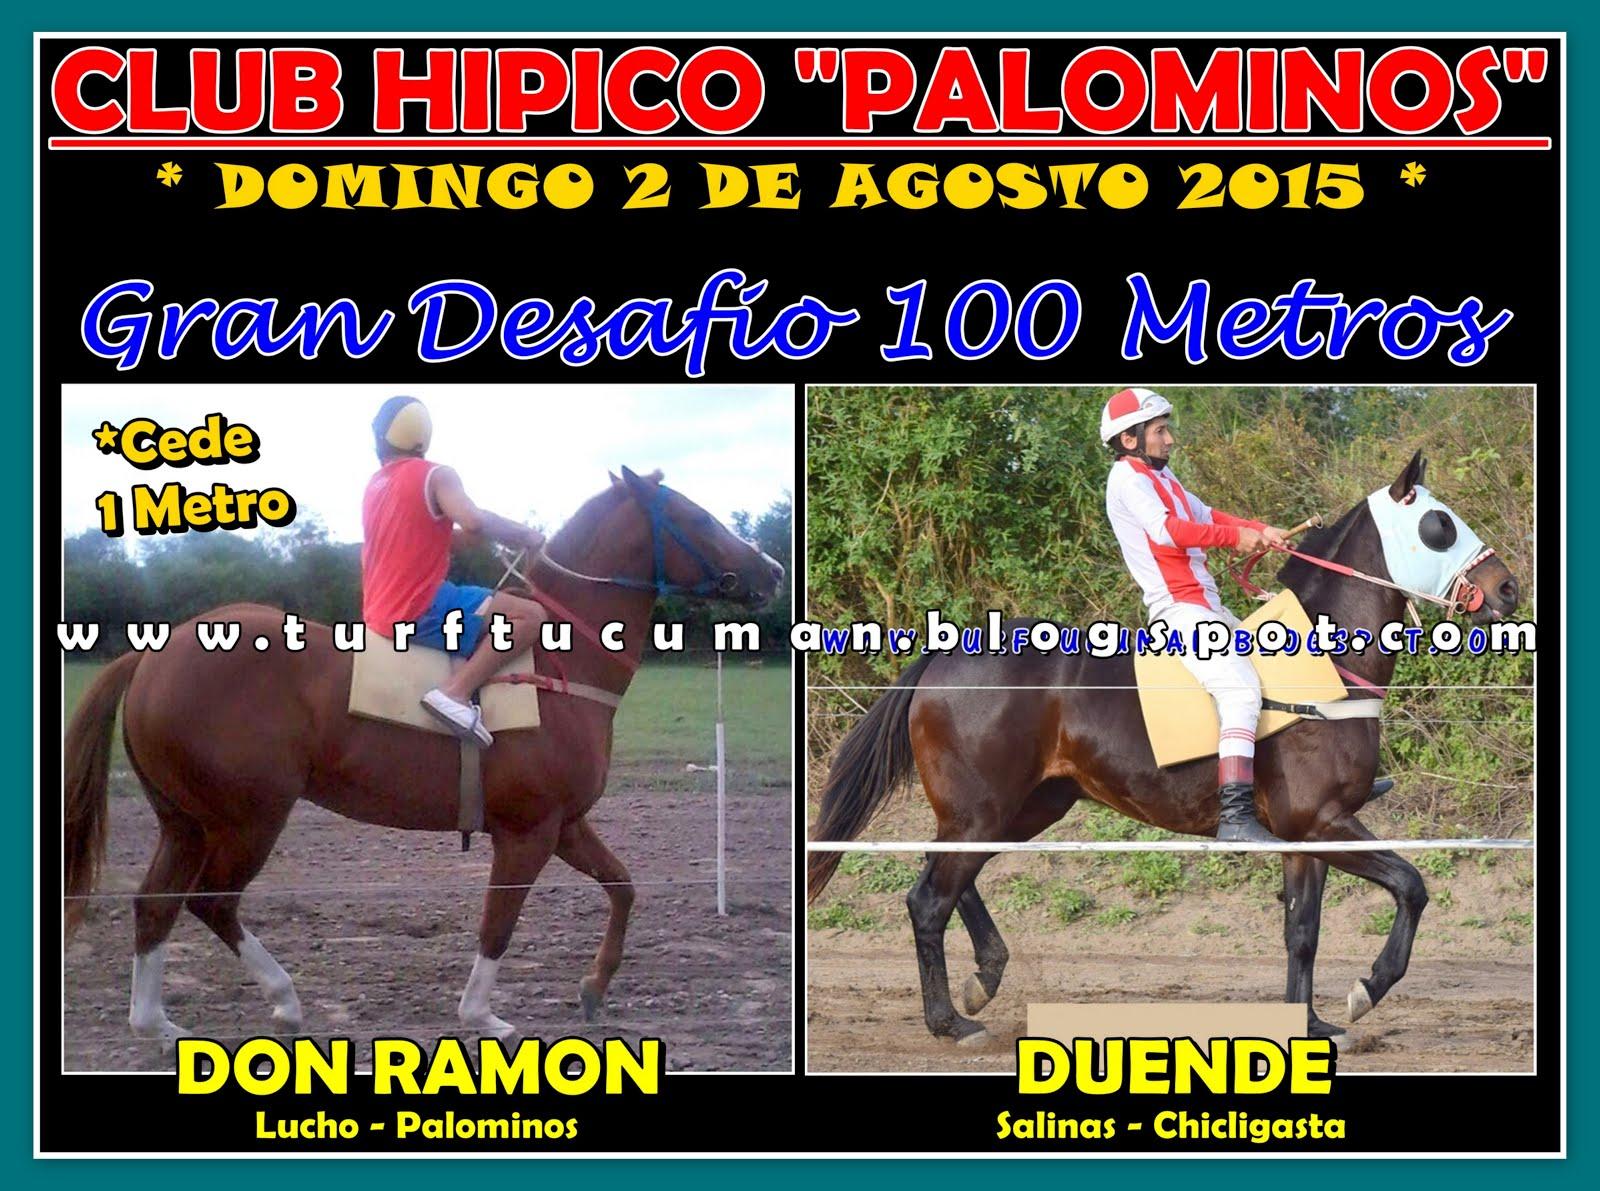 RAMON VS DUENDE